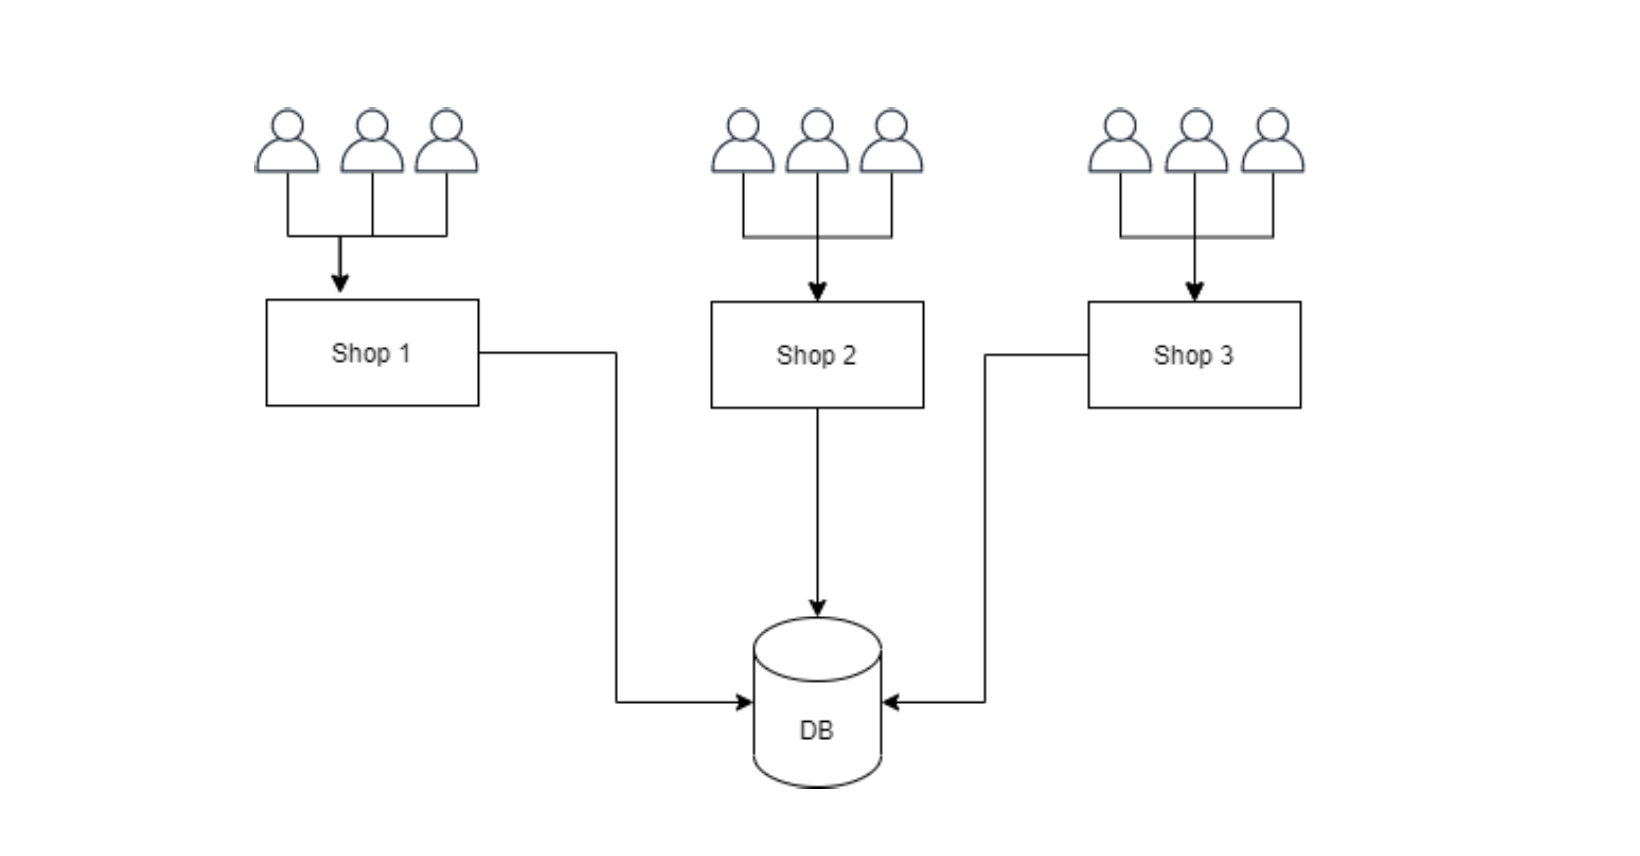 DOKANS - Multitenancy Based Ecommerce Platform (SAAS) - 2